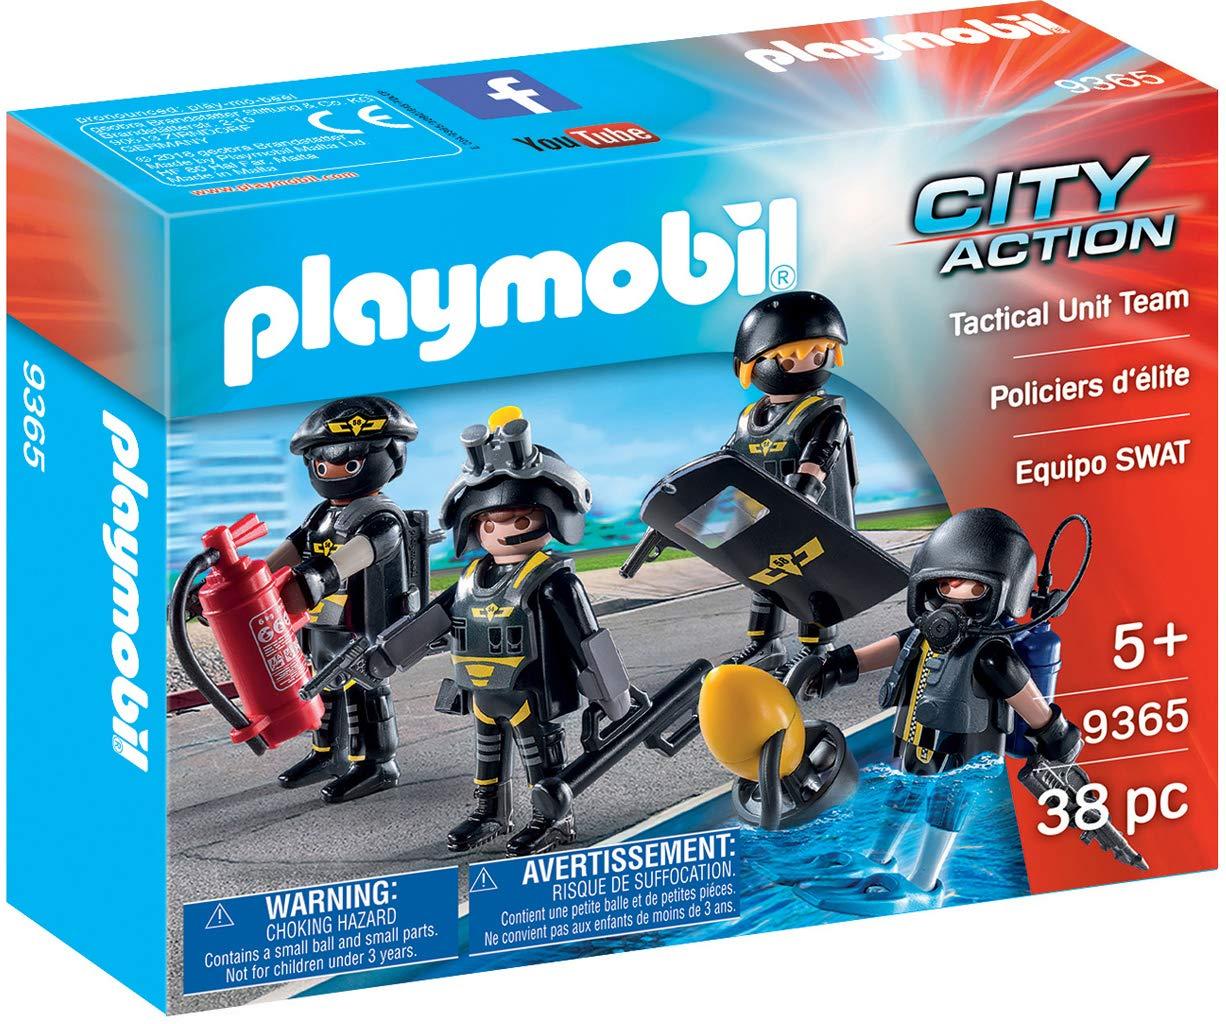 Playmobil Tactical Unit Team - $7.49 at Amazon